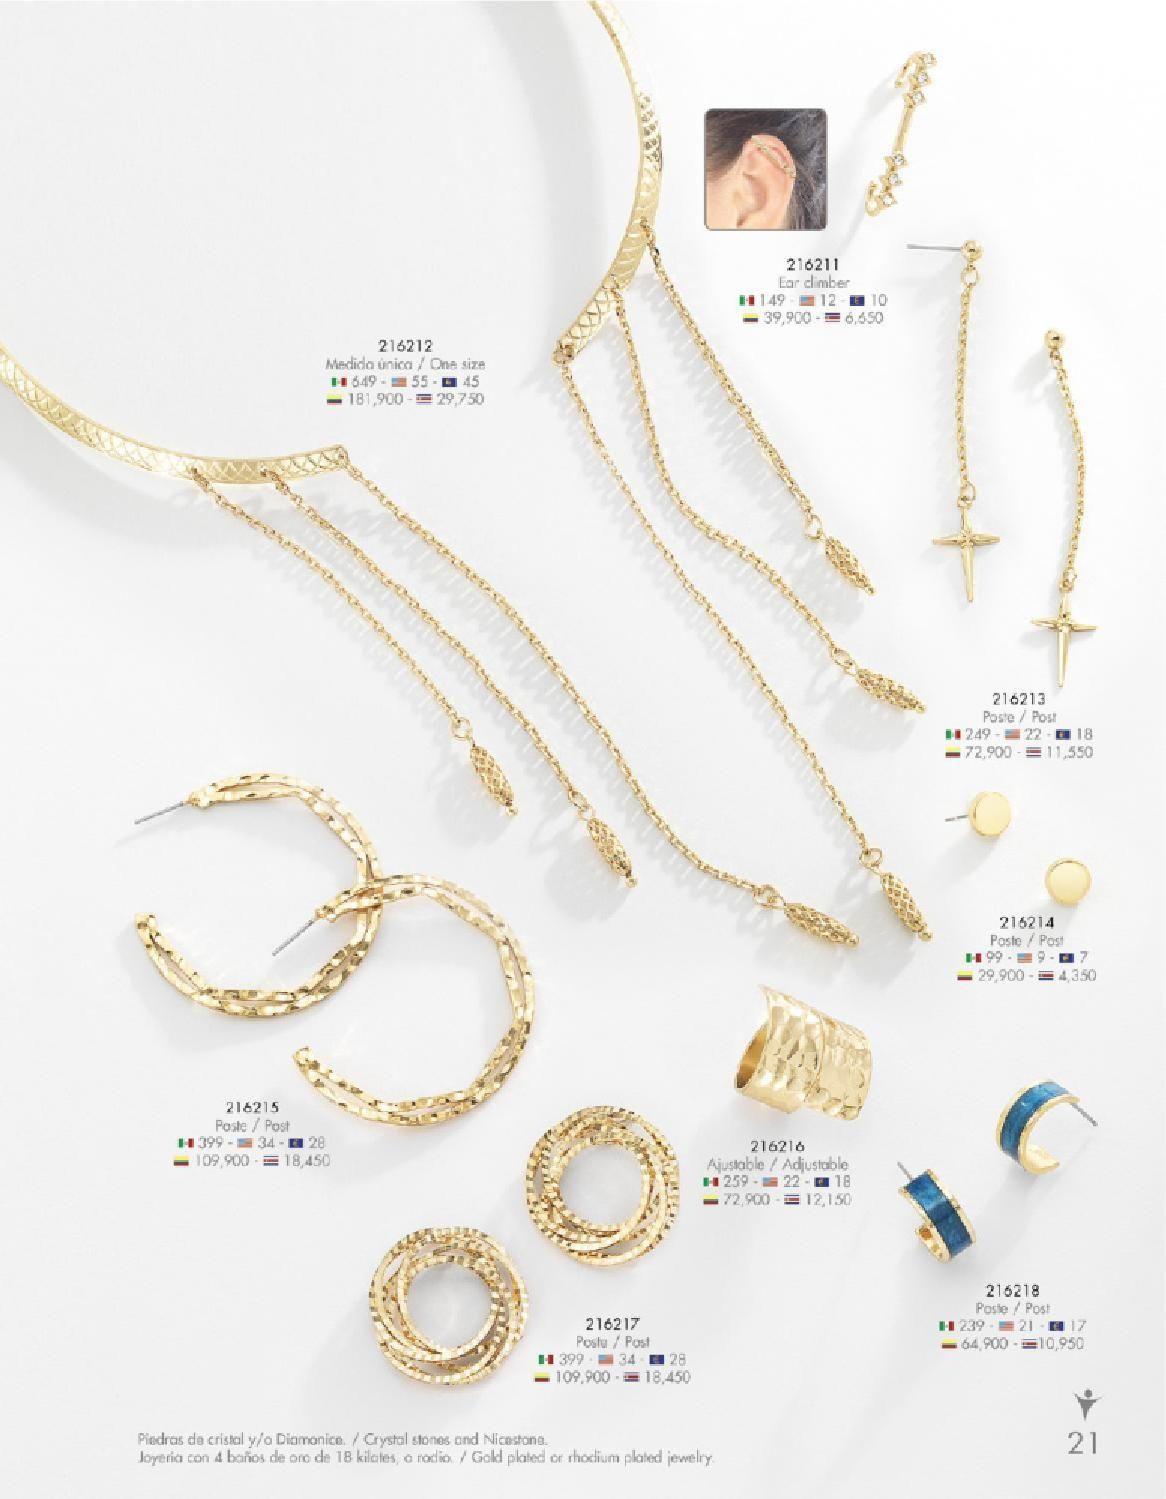 527debc29b6e Yadira y Rogelio NICE Jewelry Sets